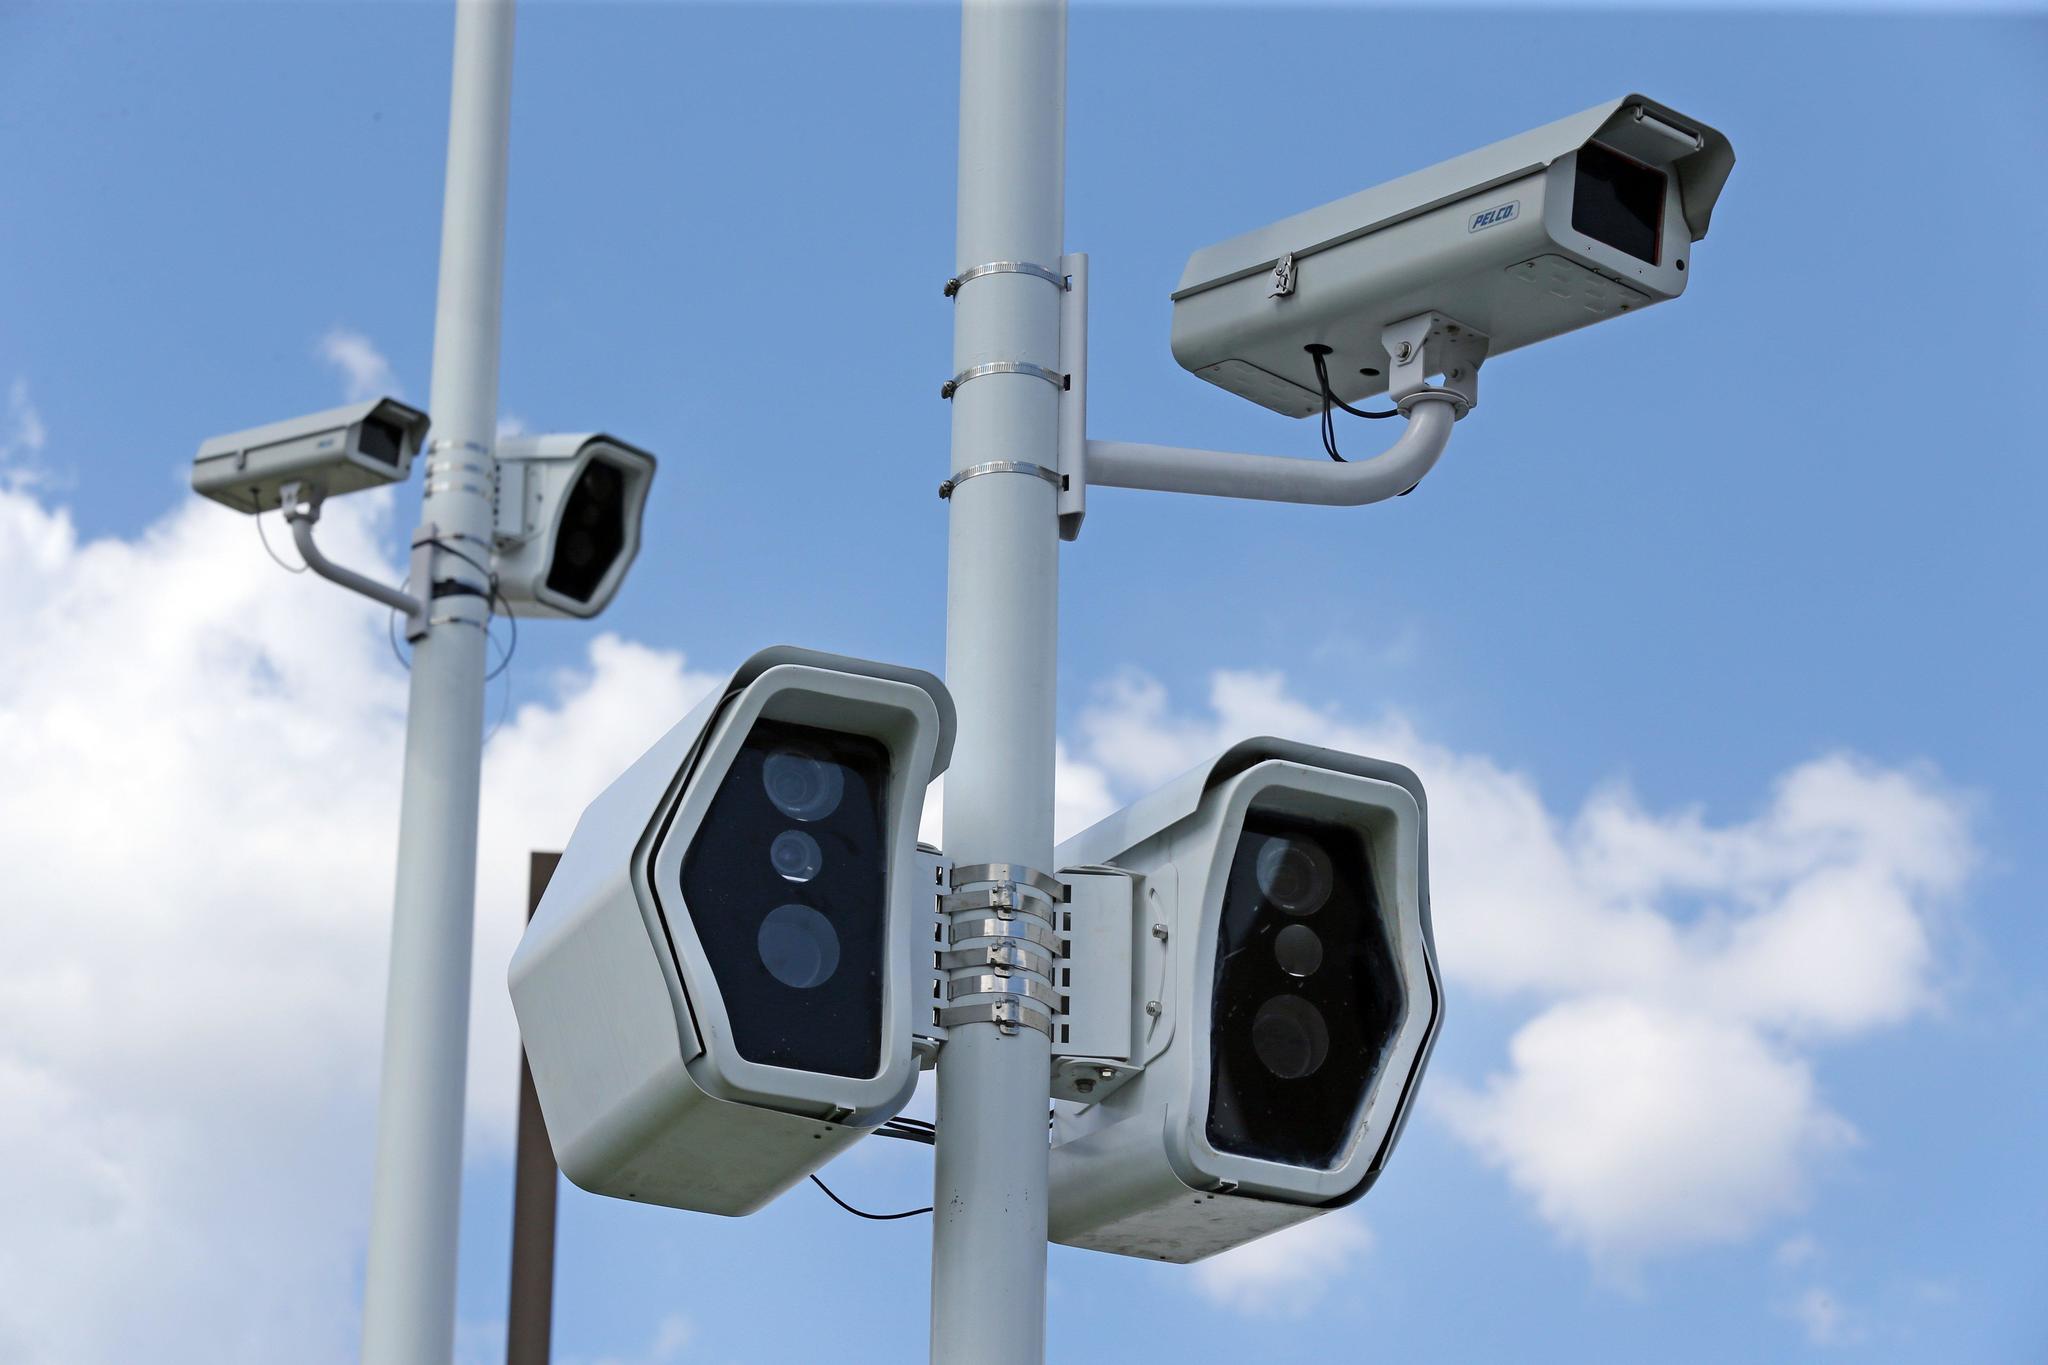 Red-light cameras generate revenue, controversy